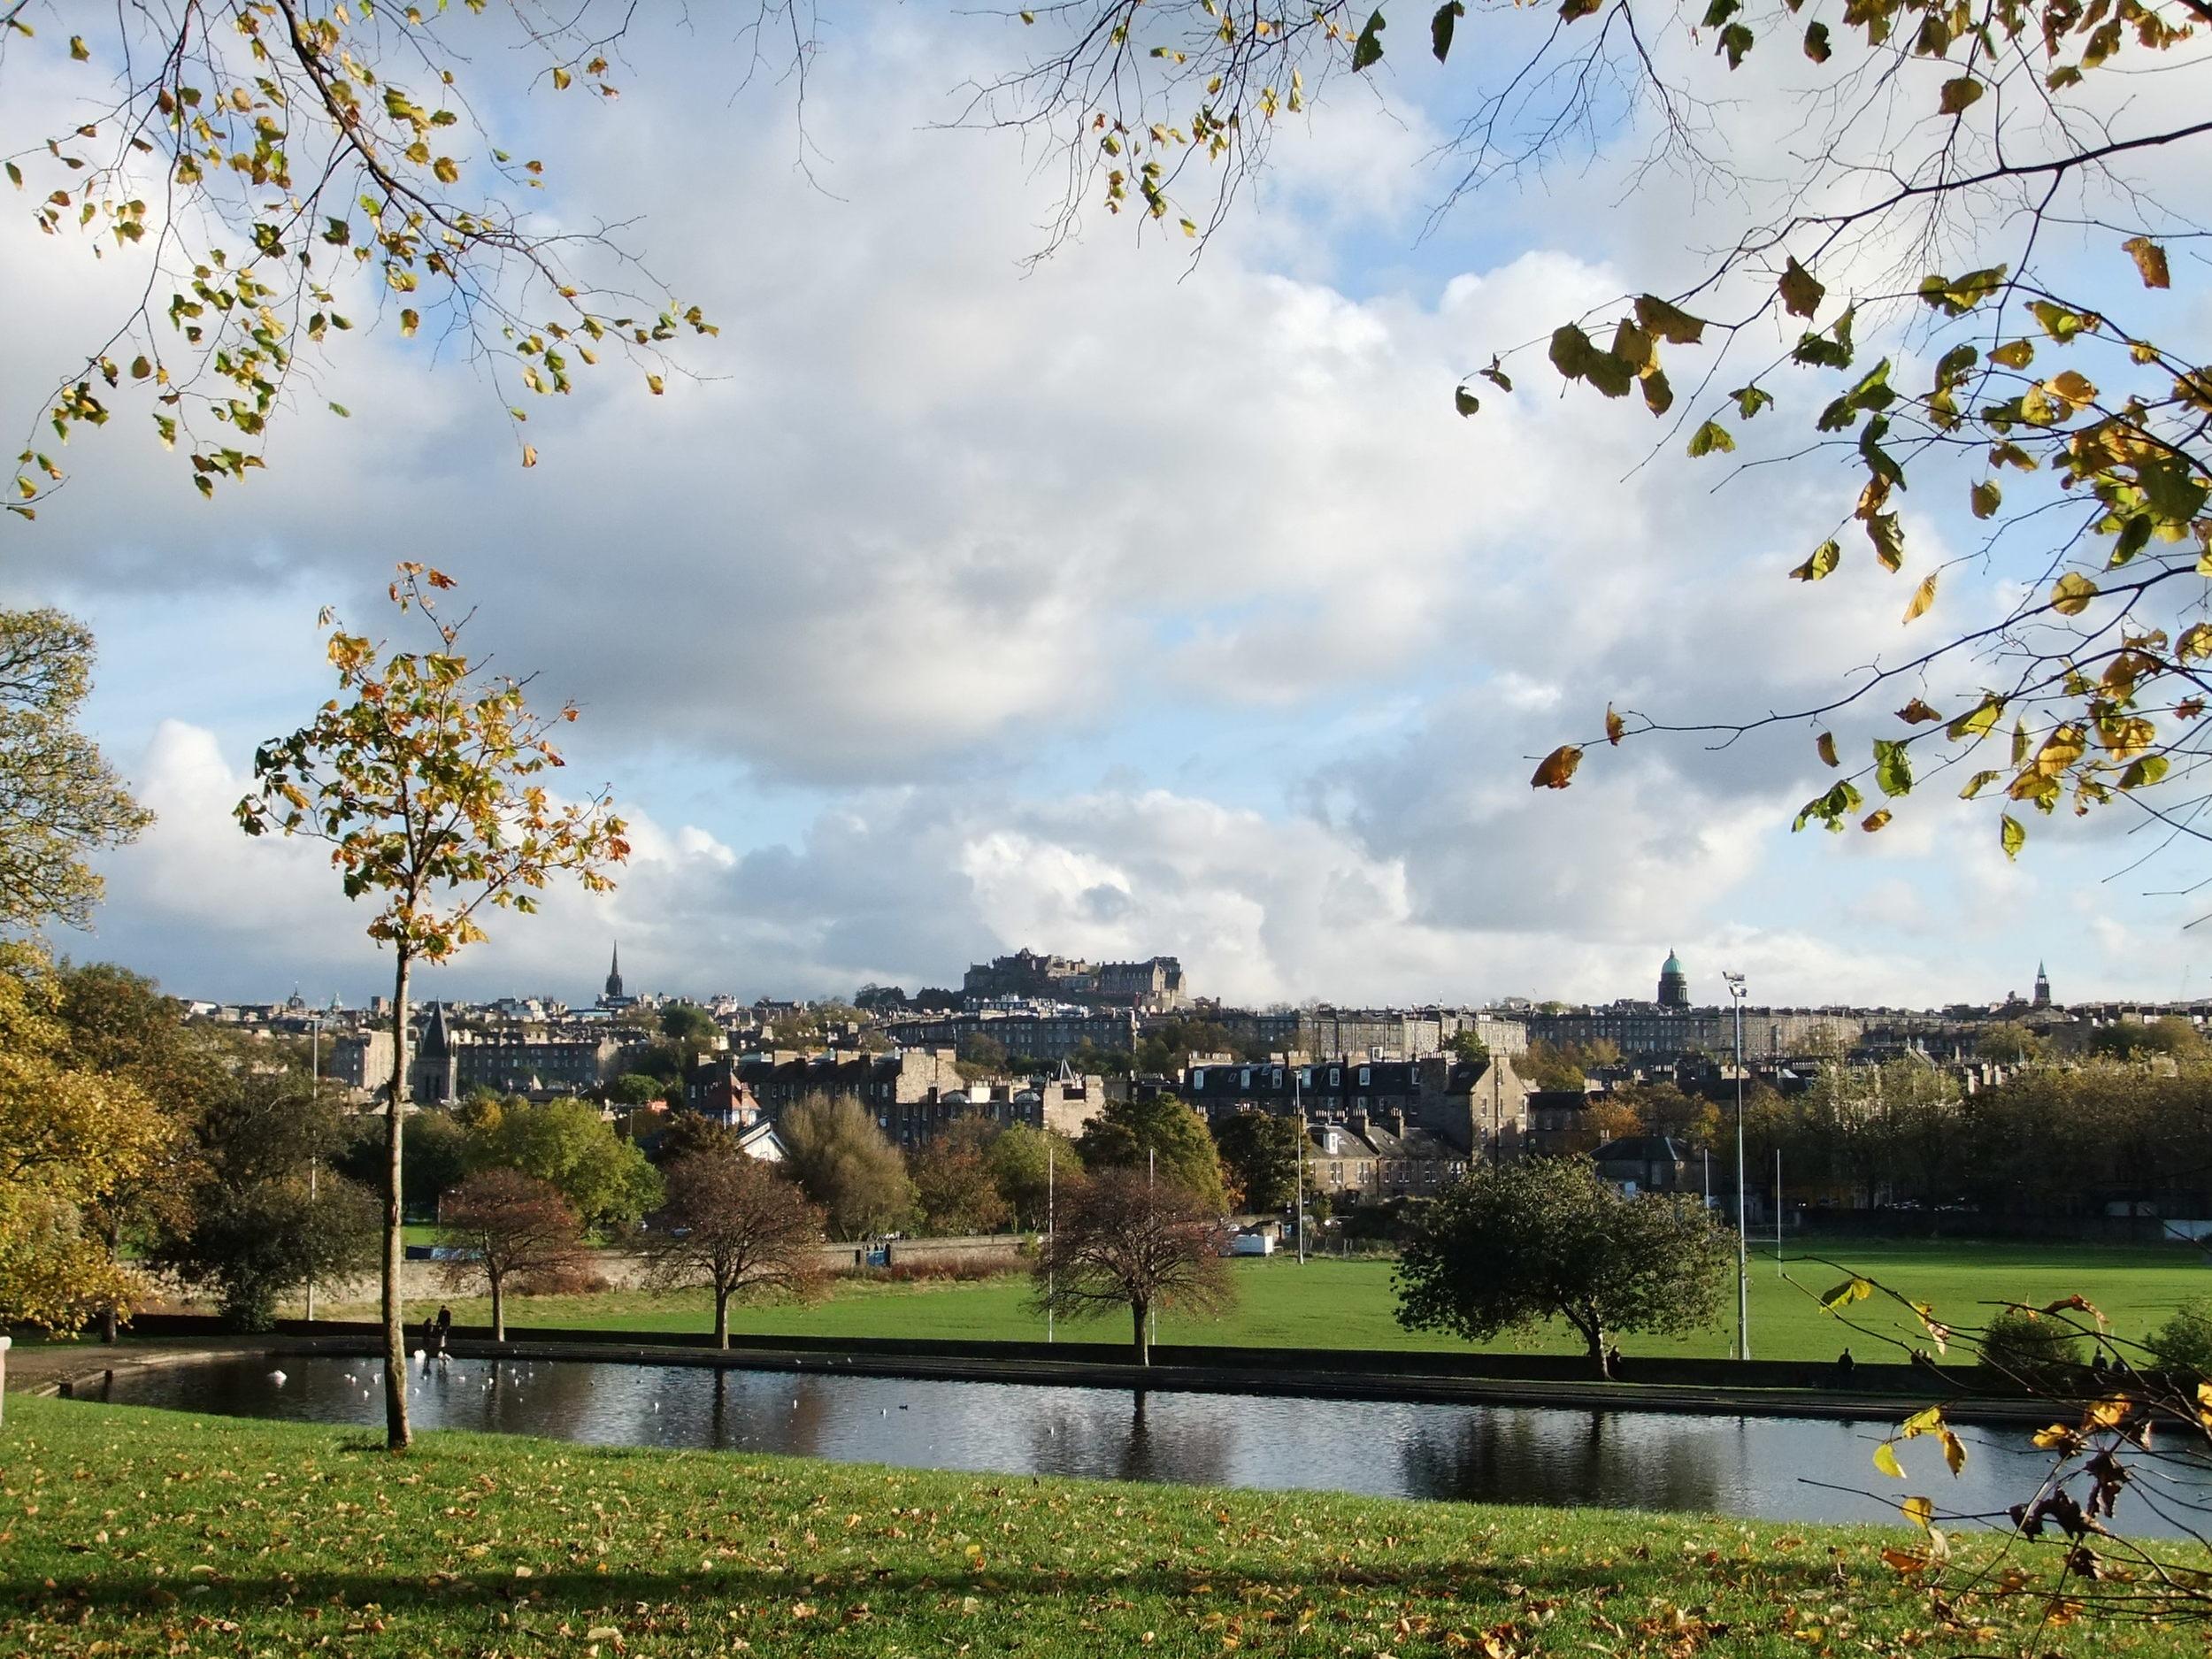 EdnburghEmergencyMedicine-Edinburgh00.JPG